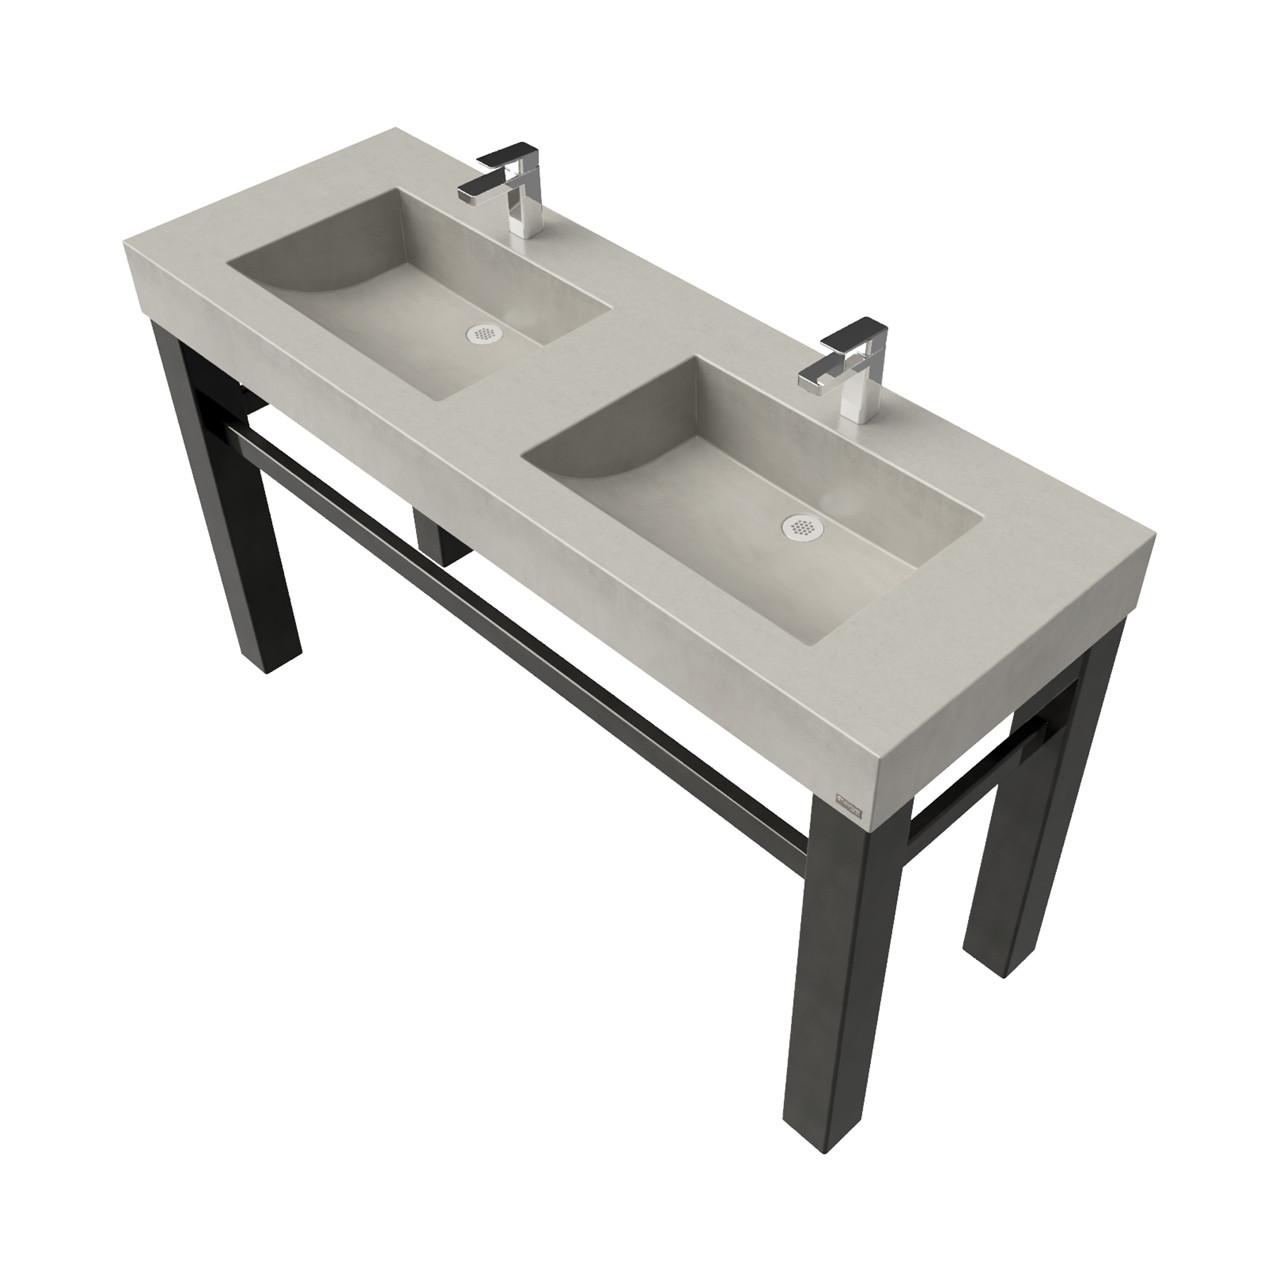 60 Industrial Vanity With Double Concrete Half Trough Sinks Trueform Concrete